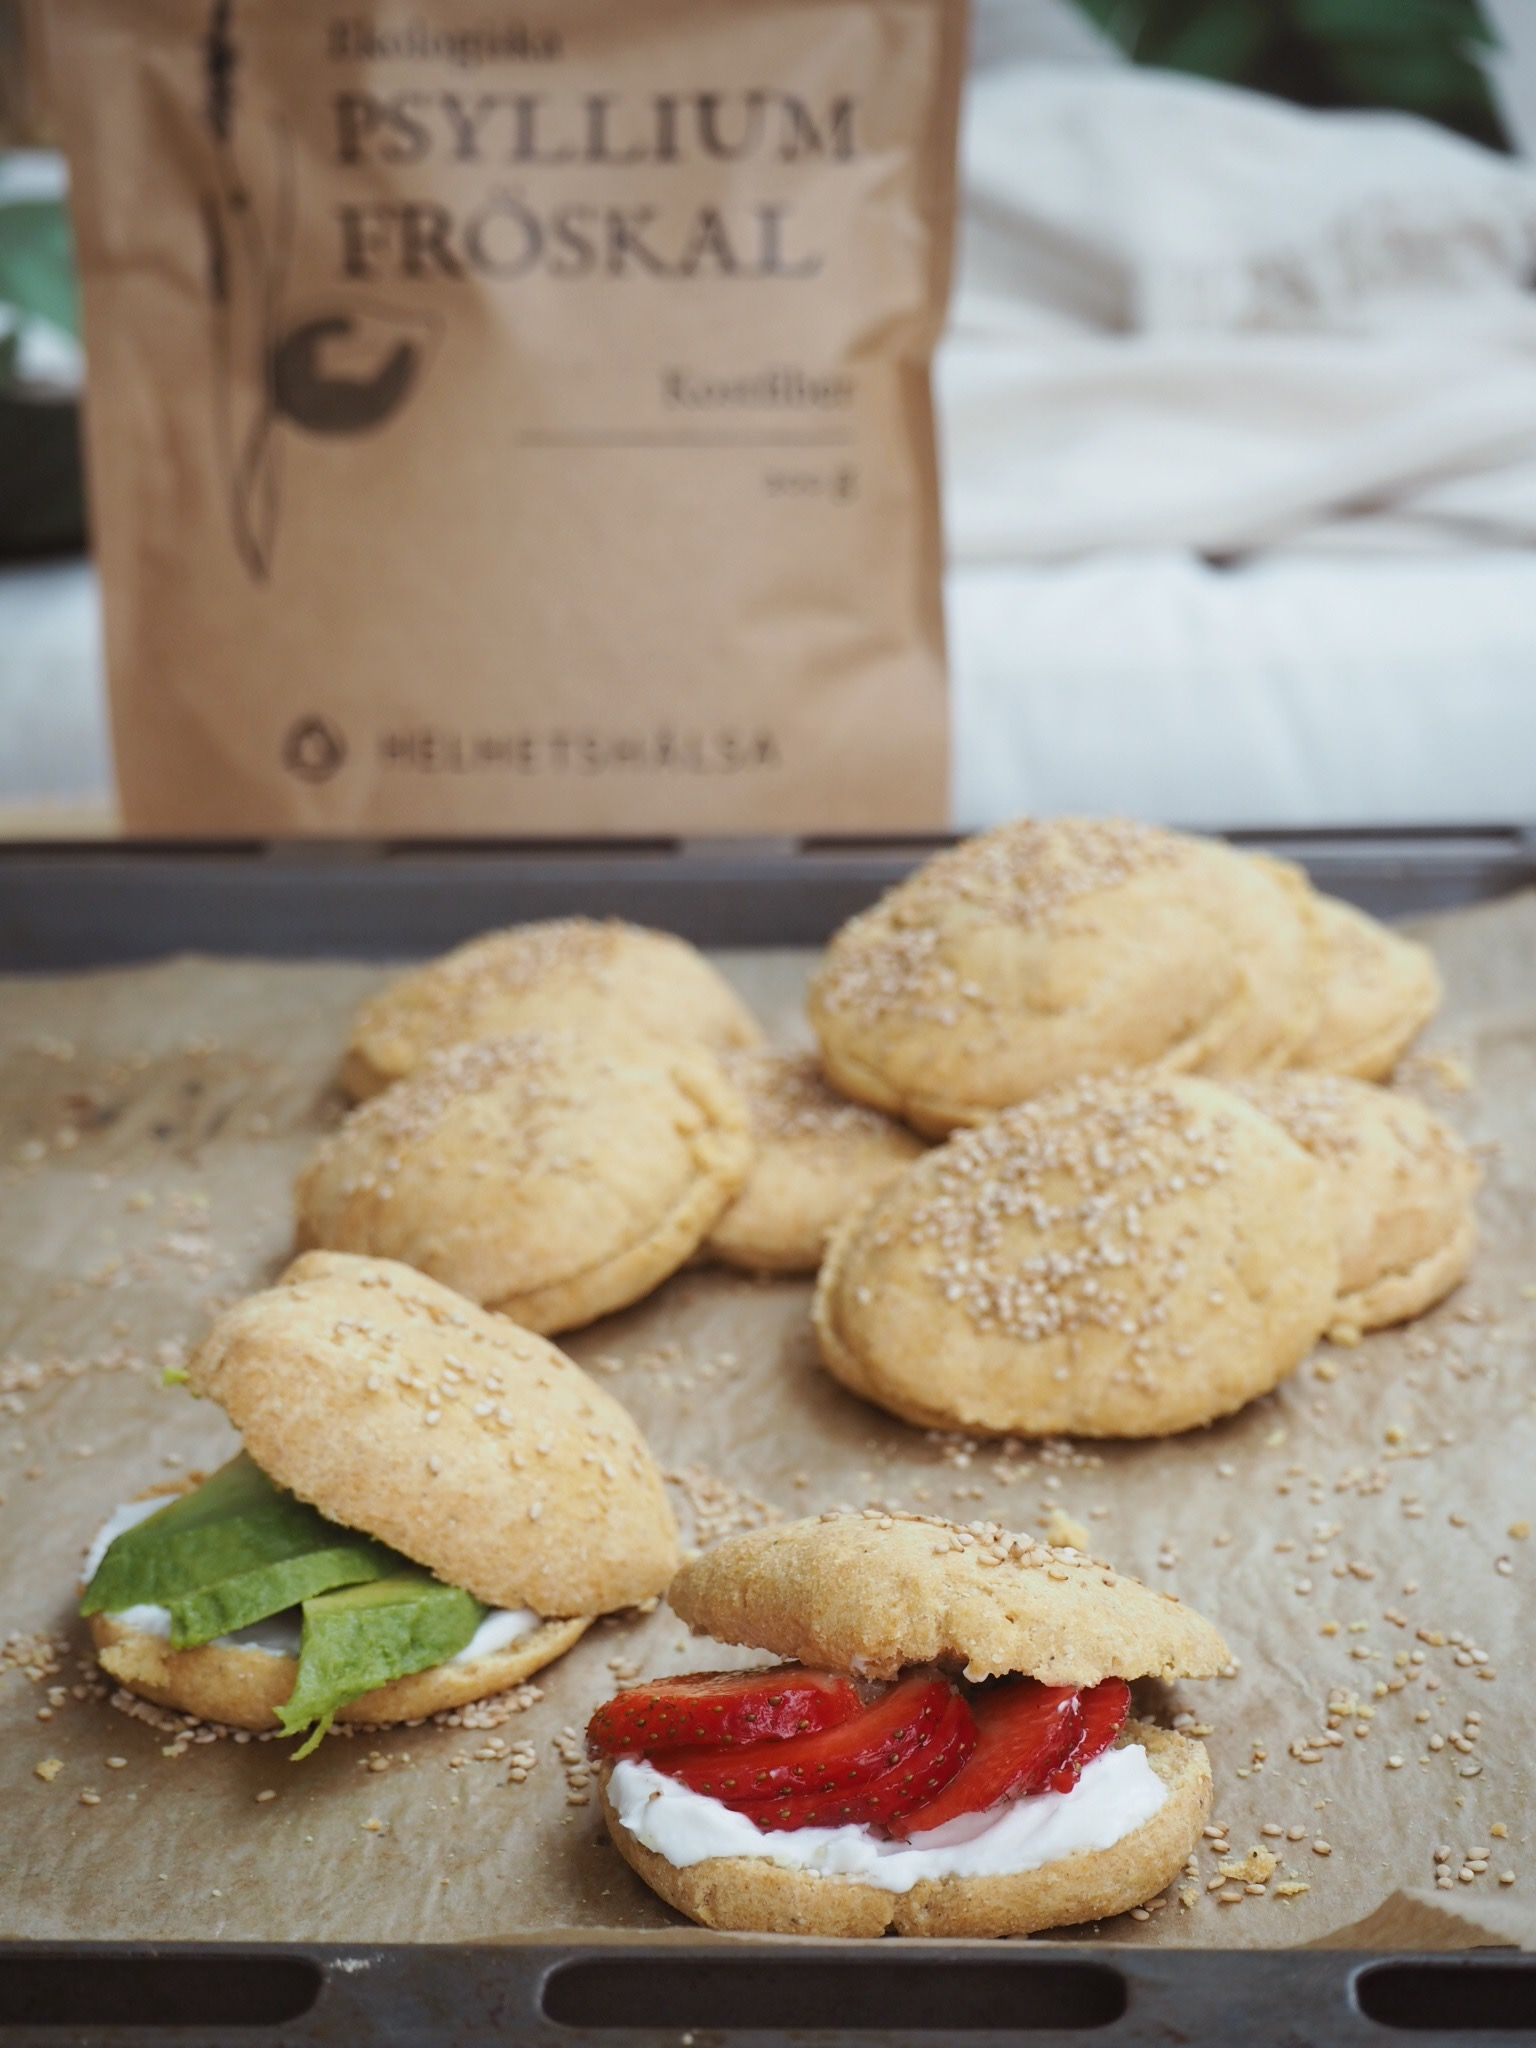 Kikärtsscones, Glutenfria scones av kikärtsmjöl